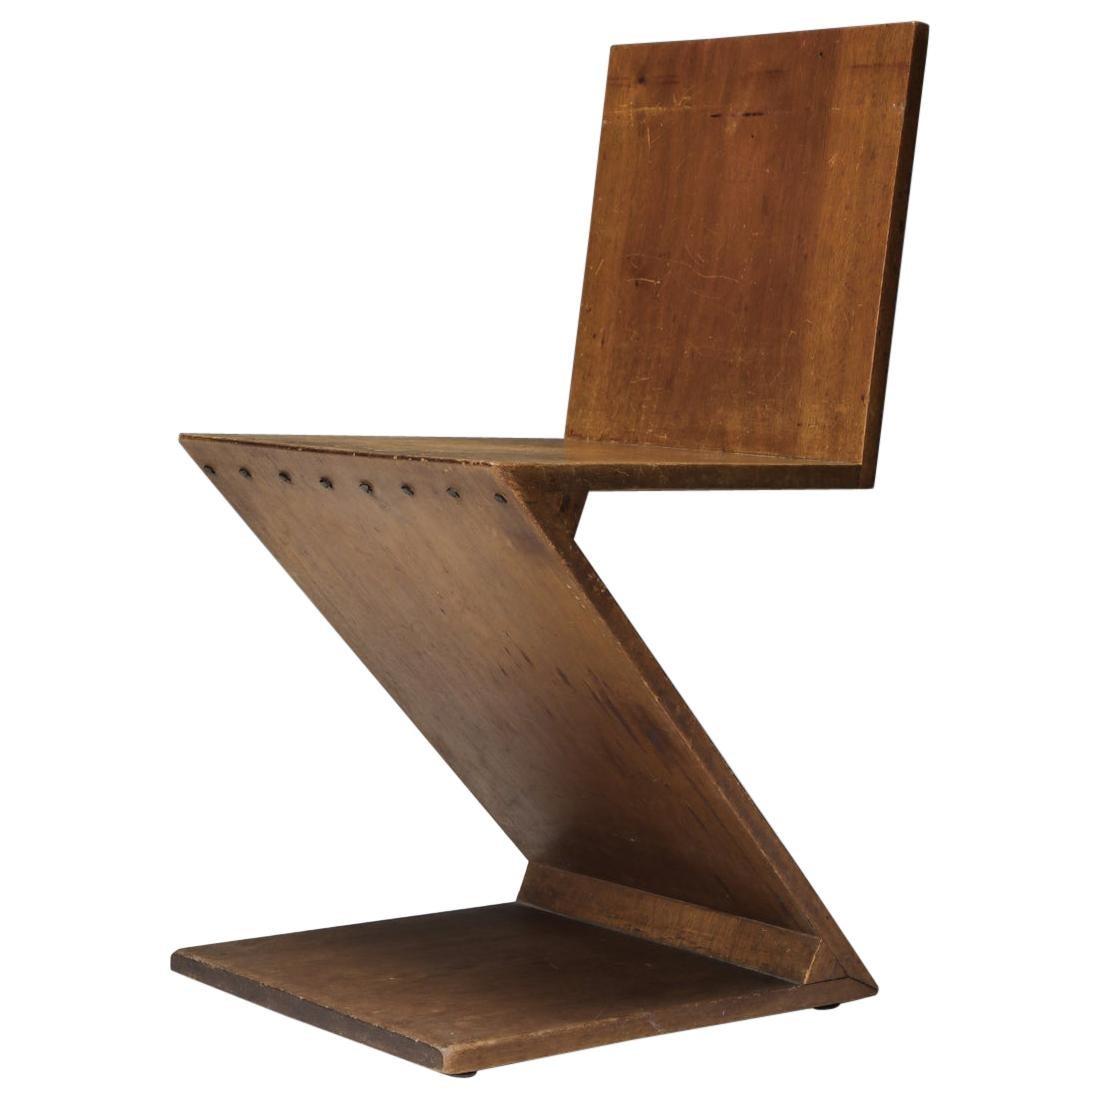 Zig-Zag Chair by G. Rietveld